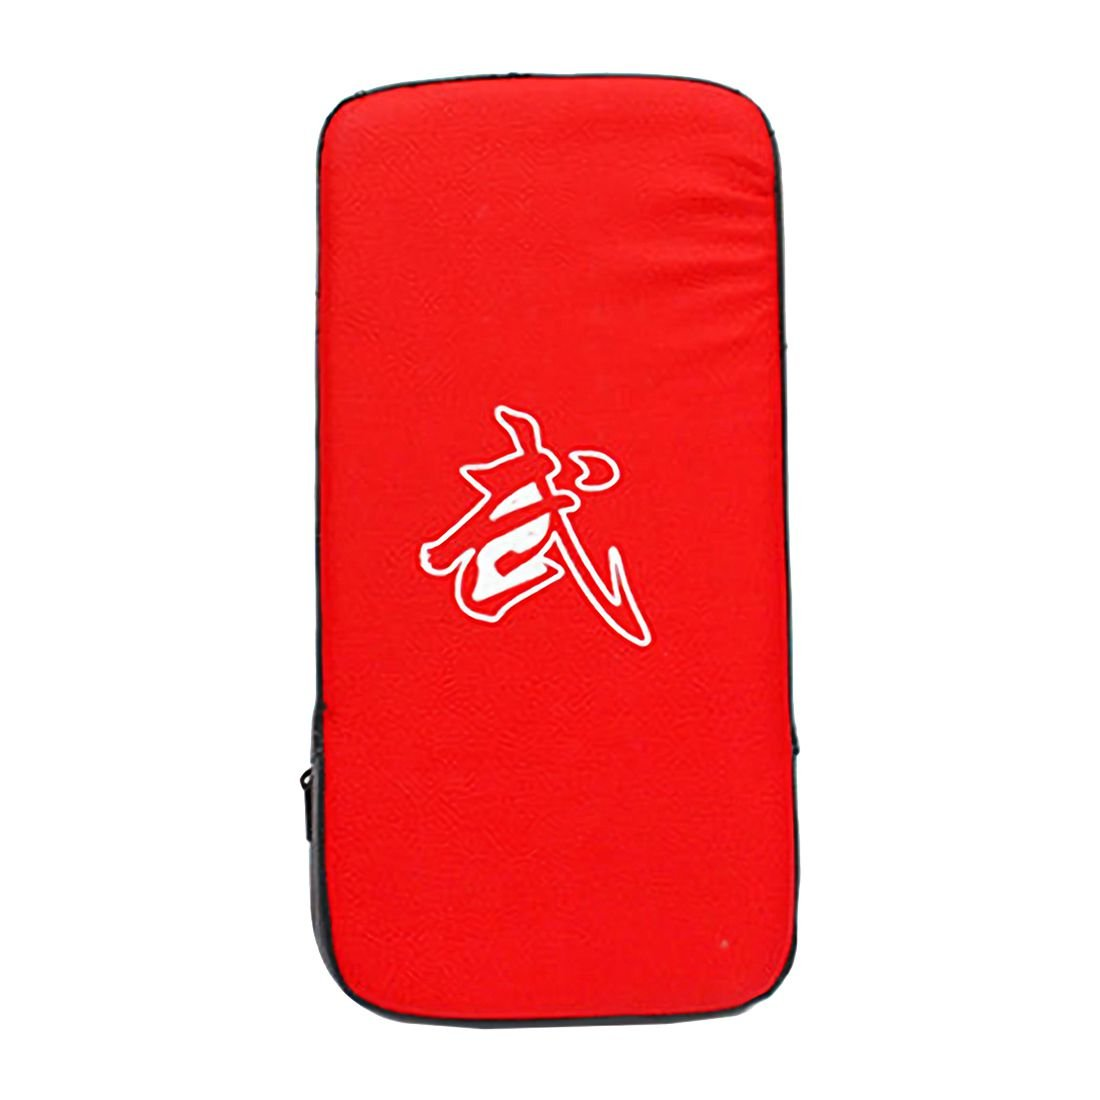 Black TOOGOO Kick Boxing Sparring Karate Strike Arm Pad Punch Bag Shield Training Target R